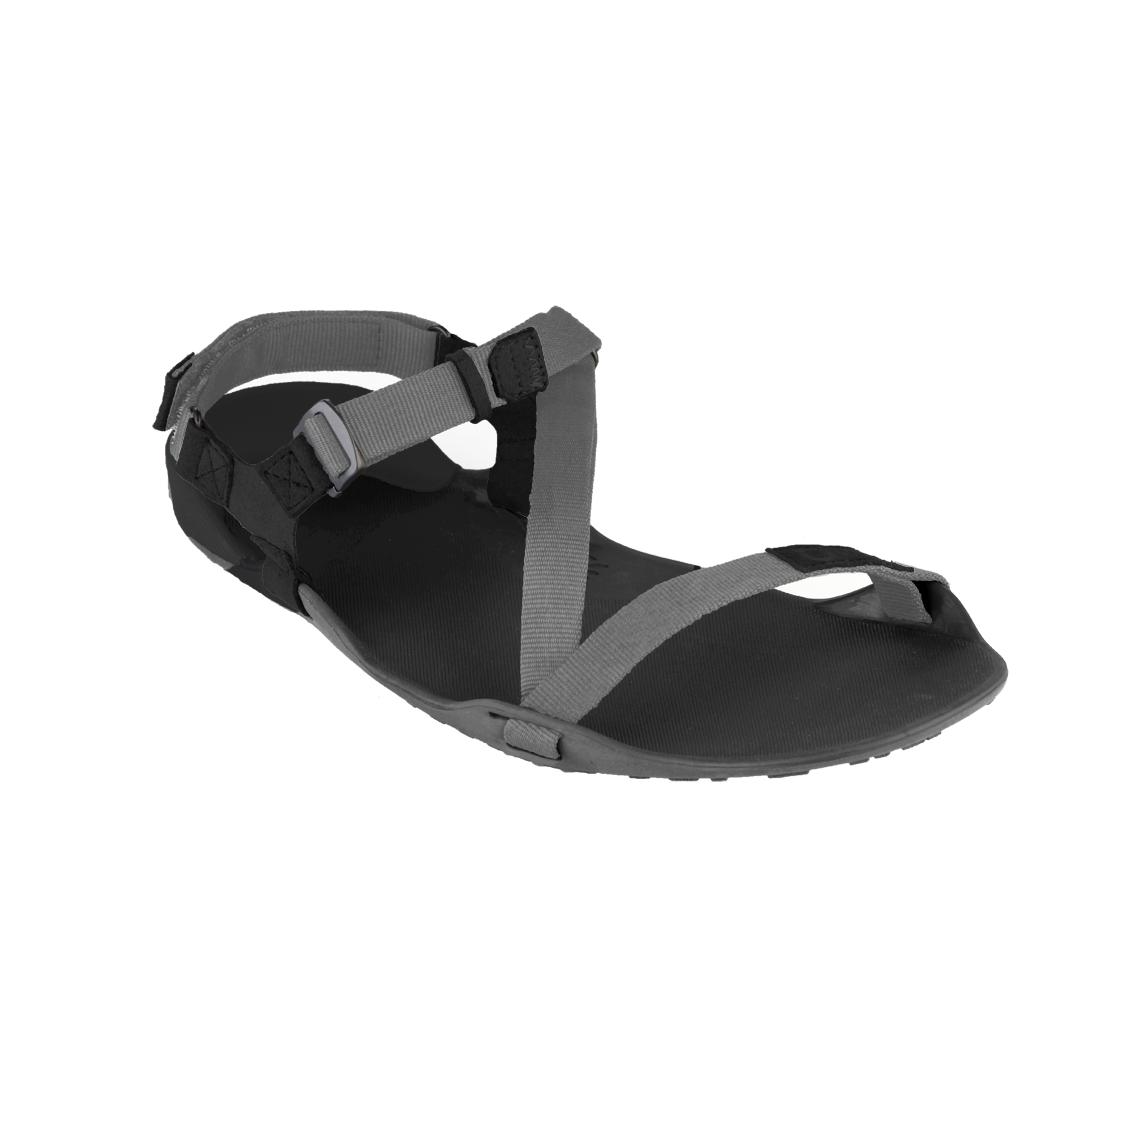 Innovative Details About Xero Shoes Women39s Amuri Venture Lightweight Performance